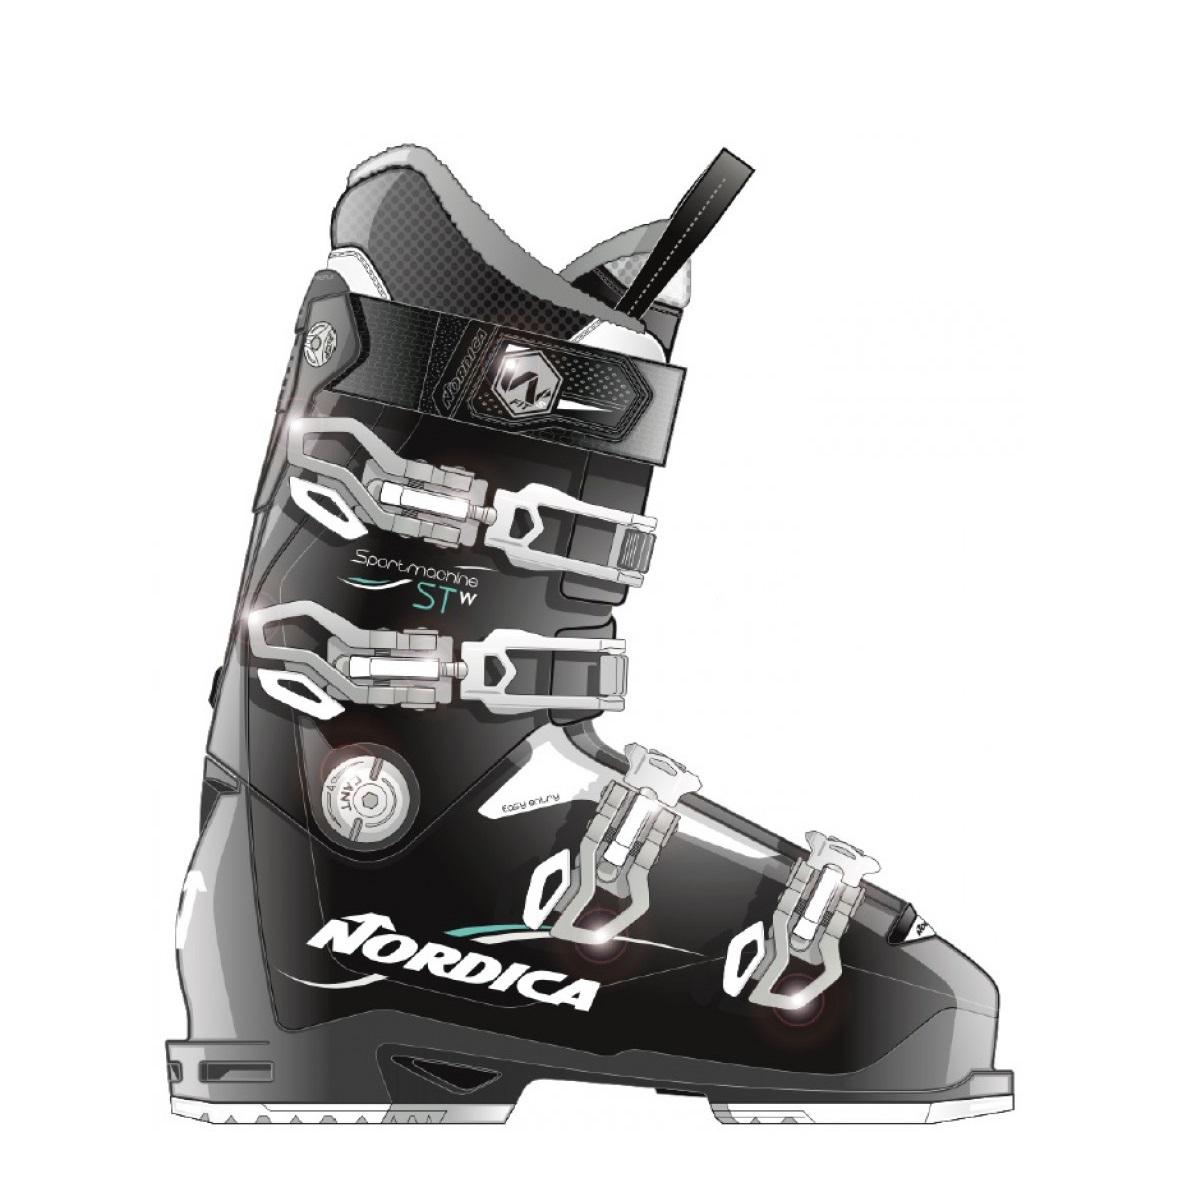 Clăpari Ski -  nordica SPORTMACHINE ST W